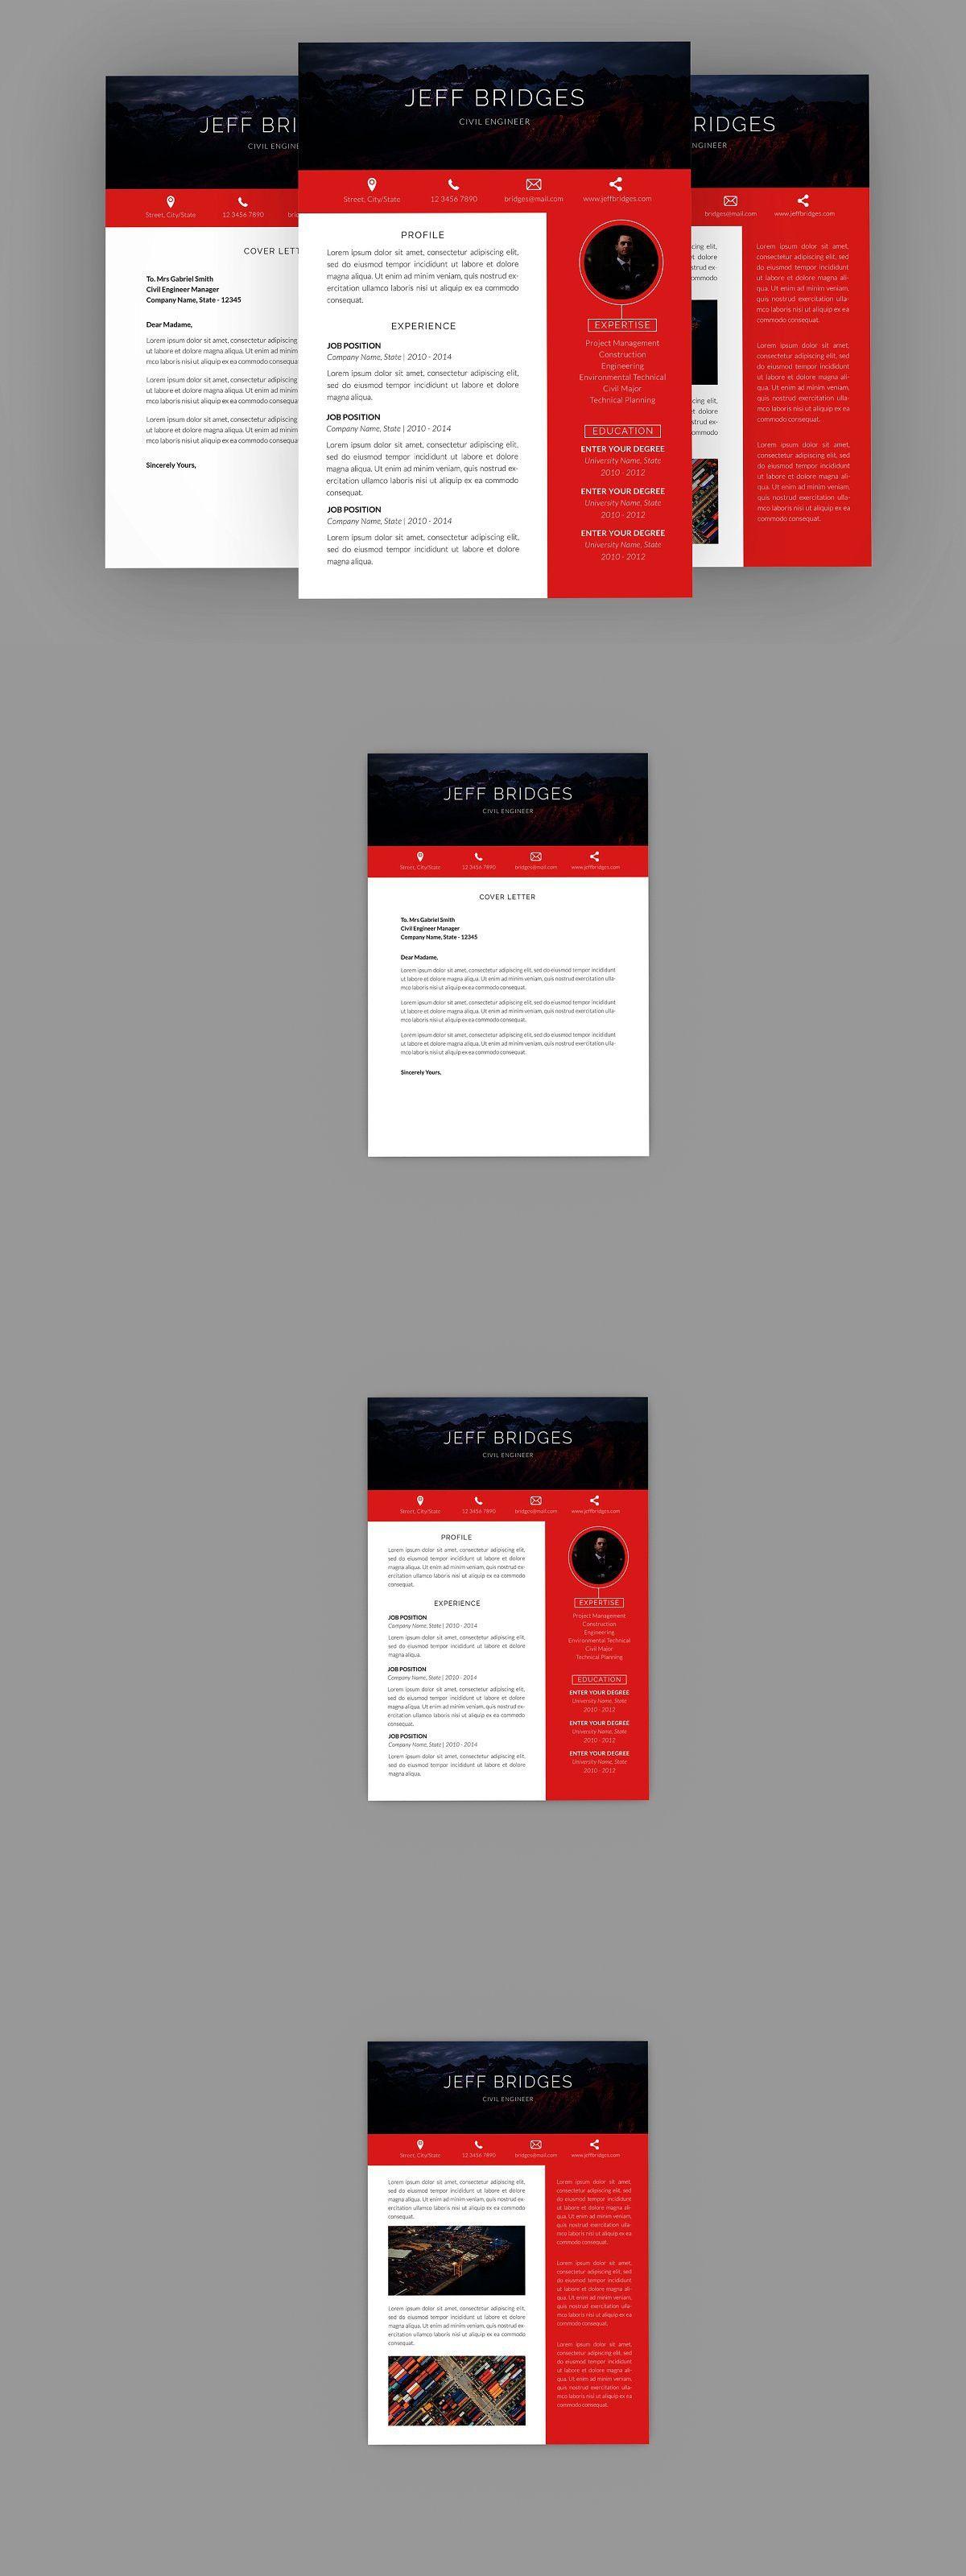 Civil engineer resume designer civil engineer resume